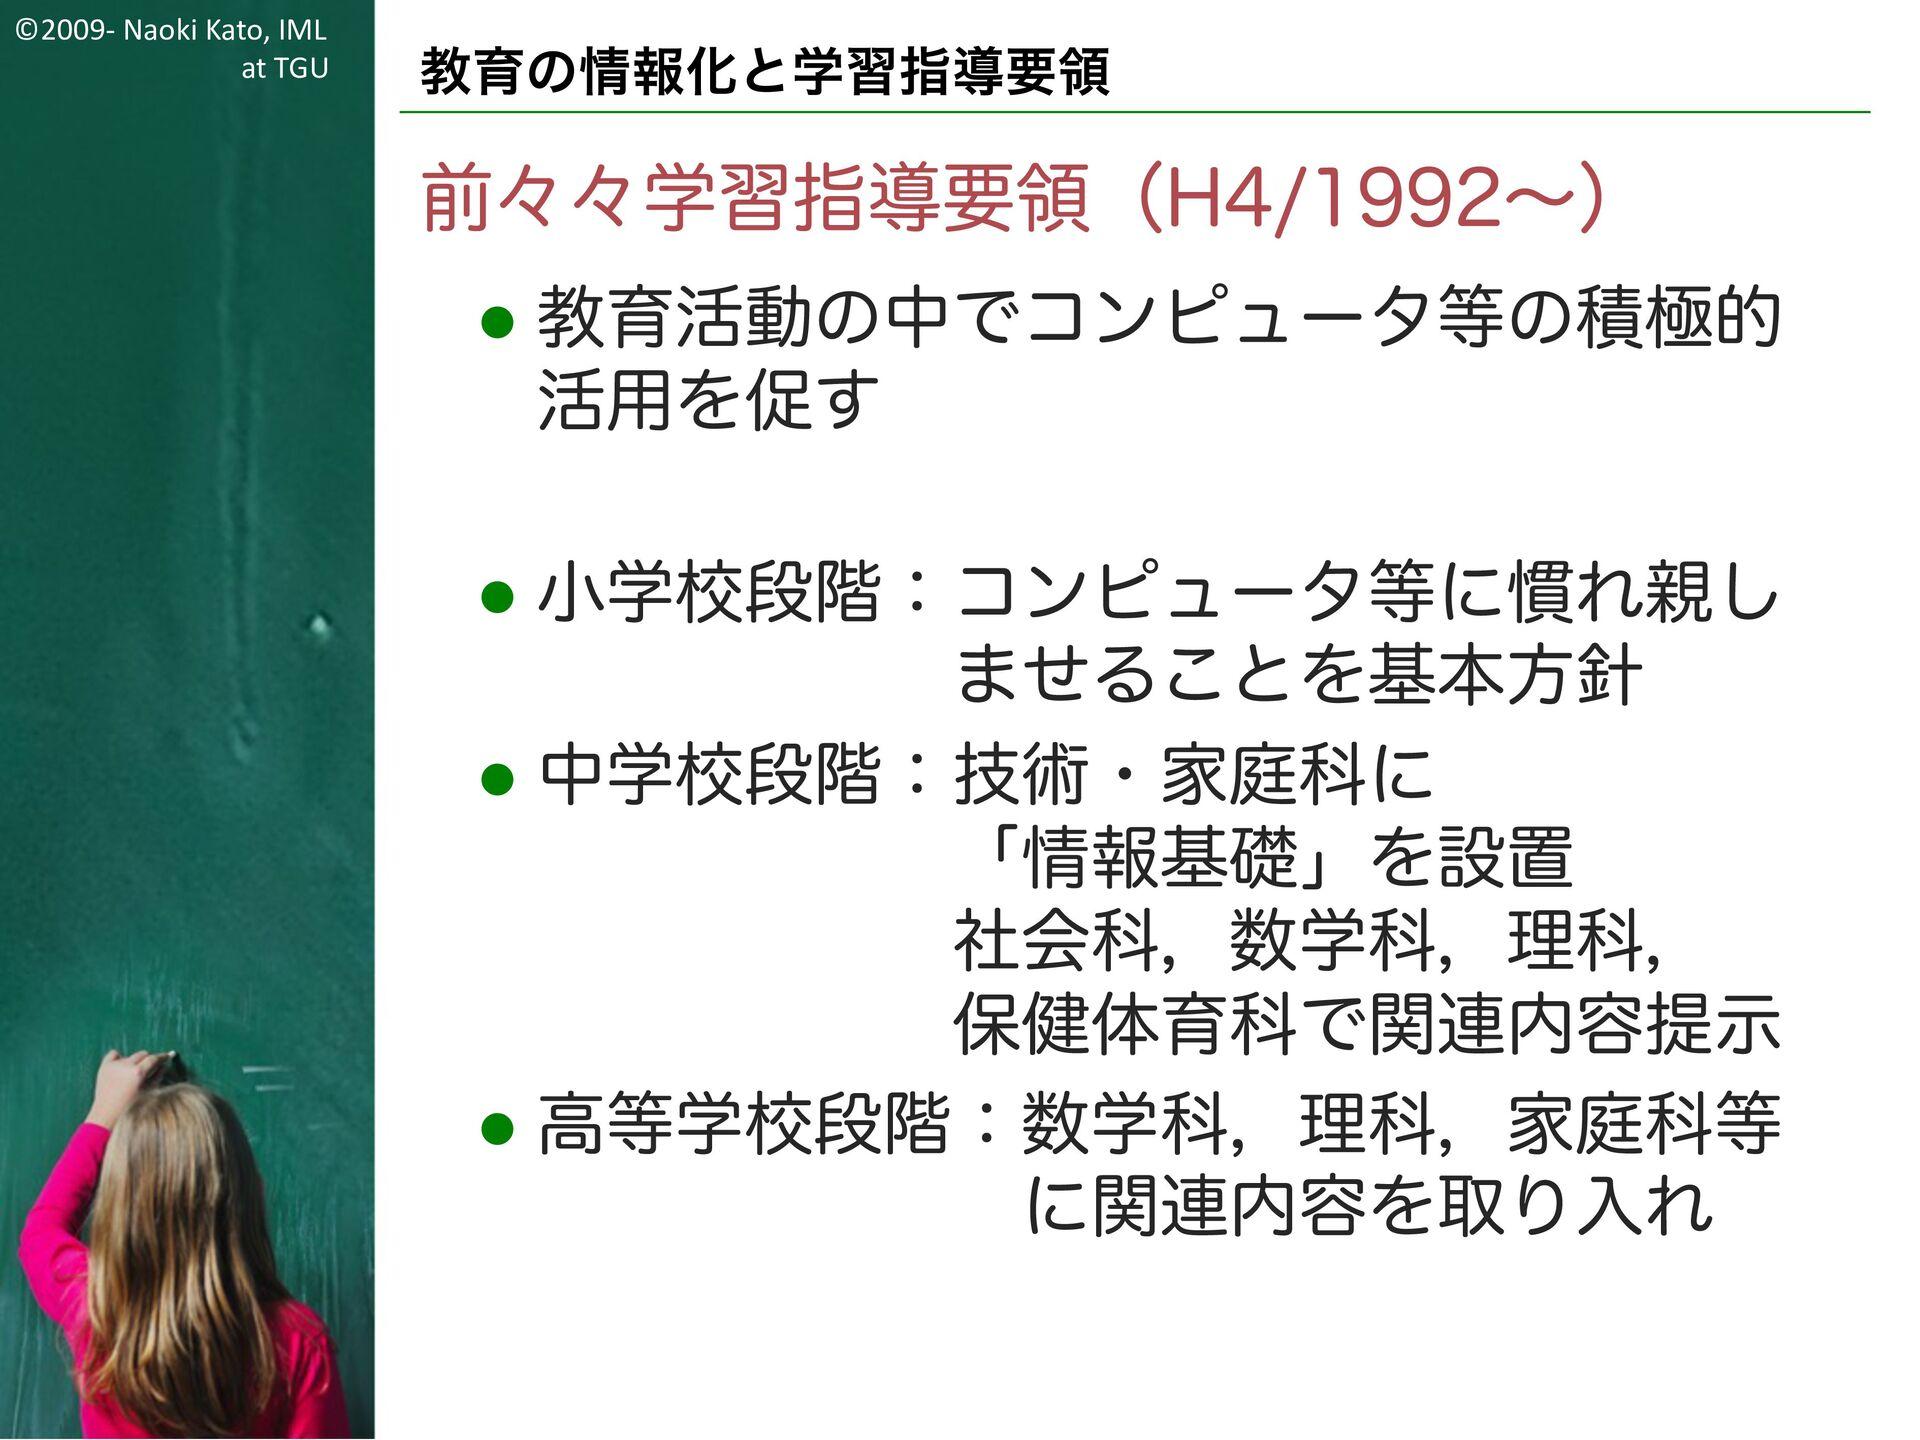 ©2009- Naoki Kato, IML at TGU 教育の情報化と学習指導要領 教育の...